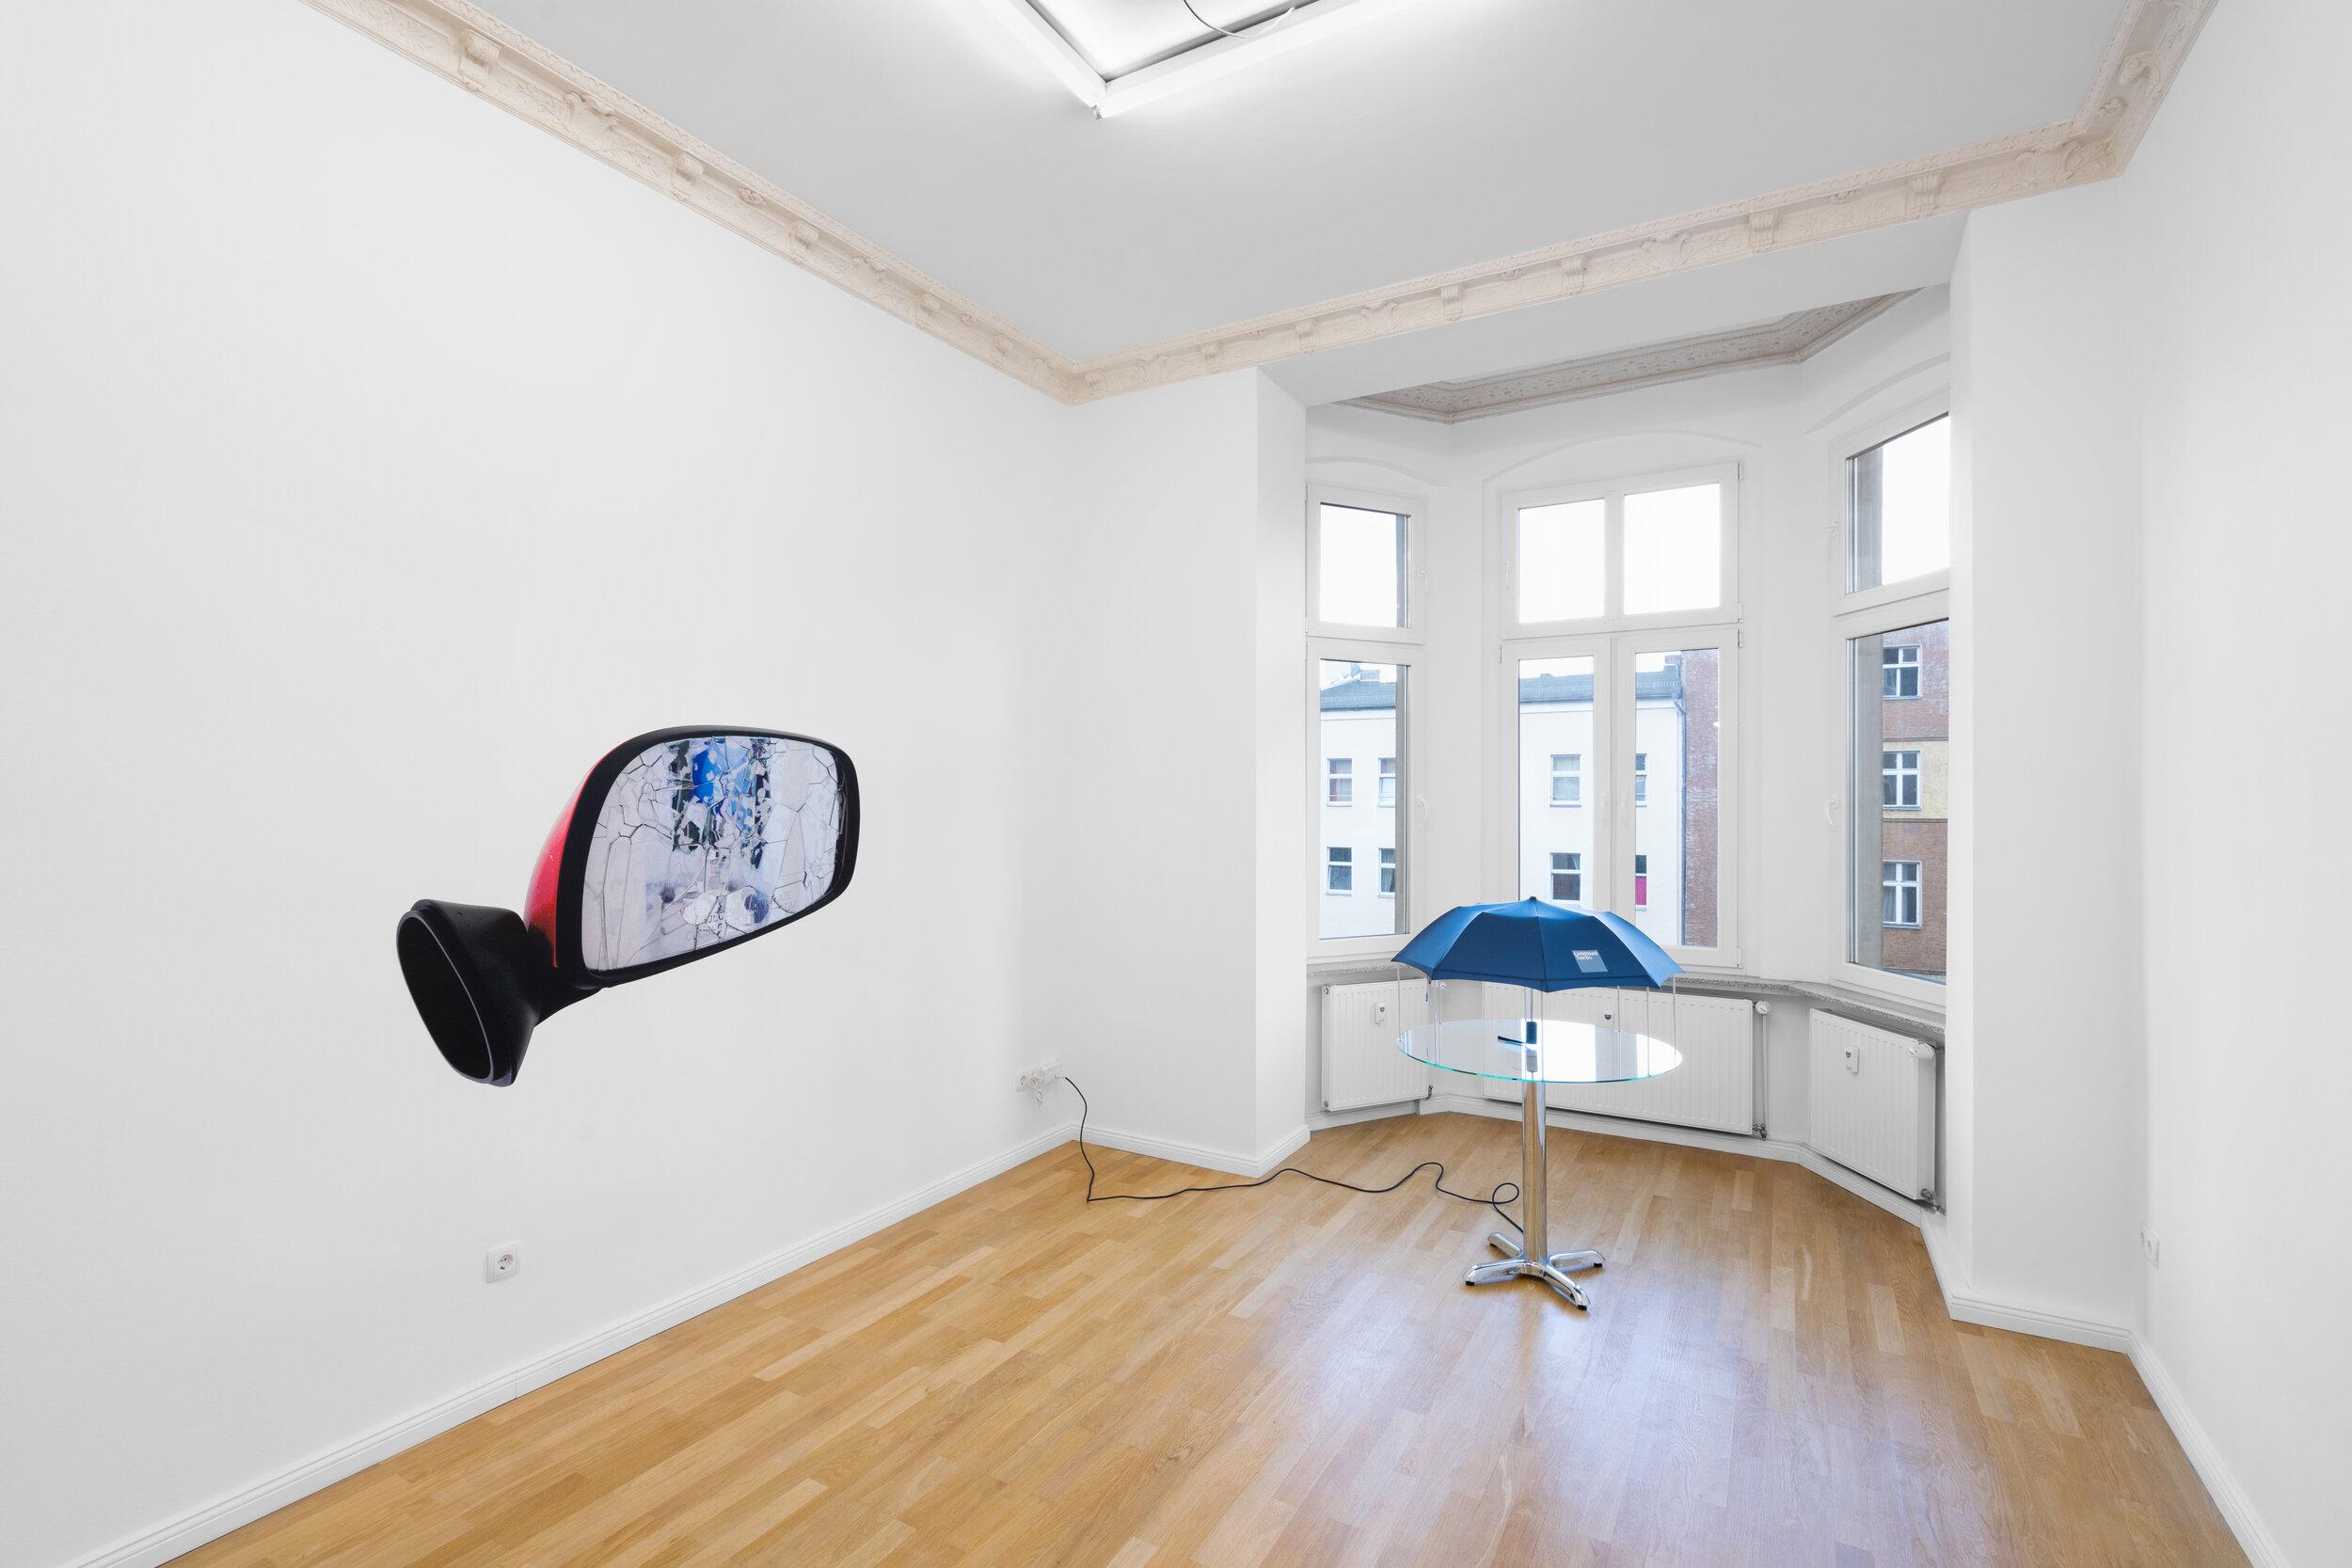 Installation view,  Andrew J. Greene, Madeline Hollander, Asha Schechter  Left: Asha Schechter,  Prius mirror from Baby Barcelona , 2019 Right: Andrew J. Greene,  Umbrella Dryer (Goldman Sachs) , 2017/2019